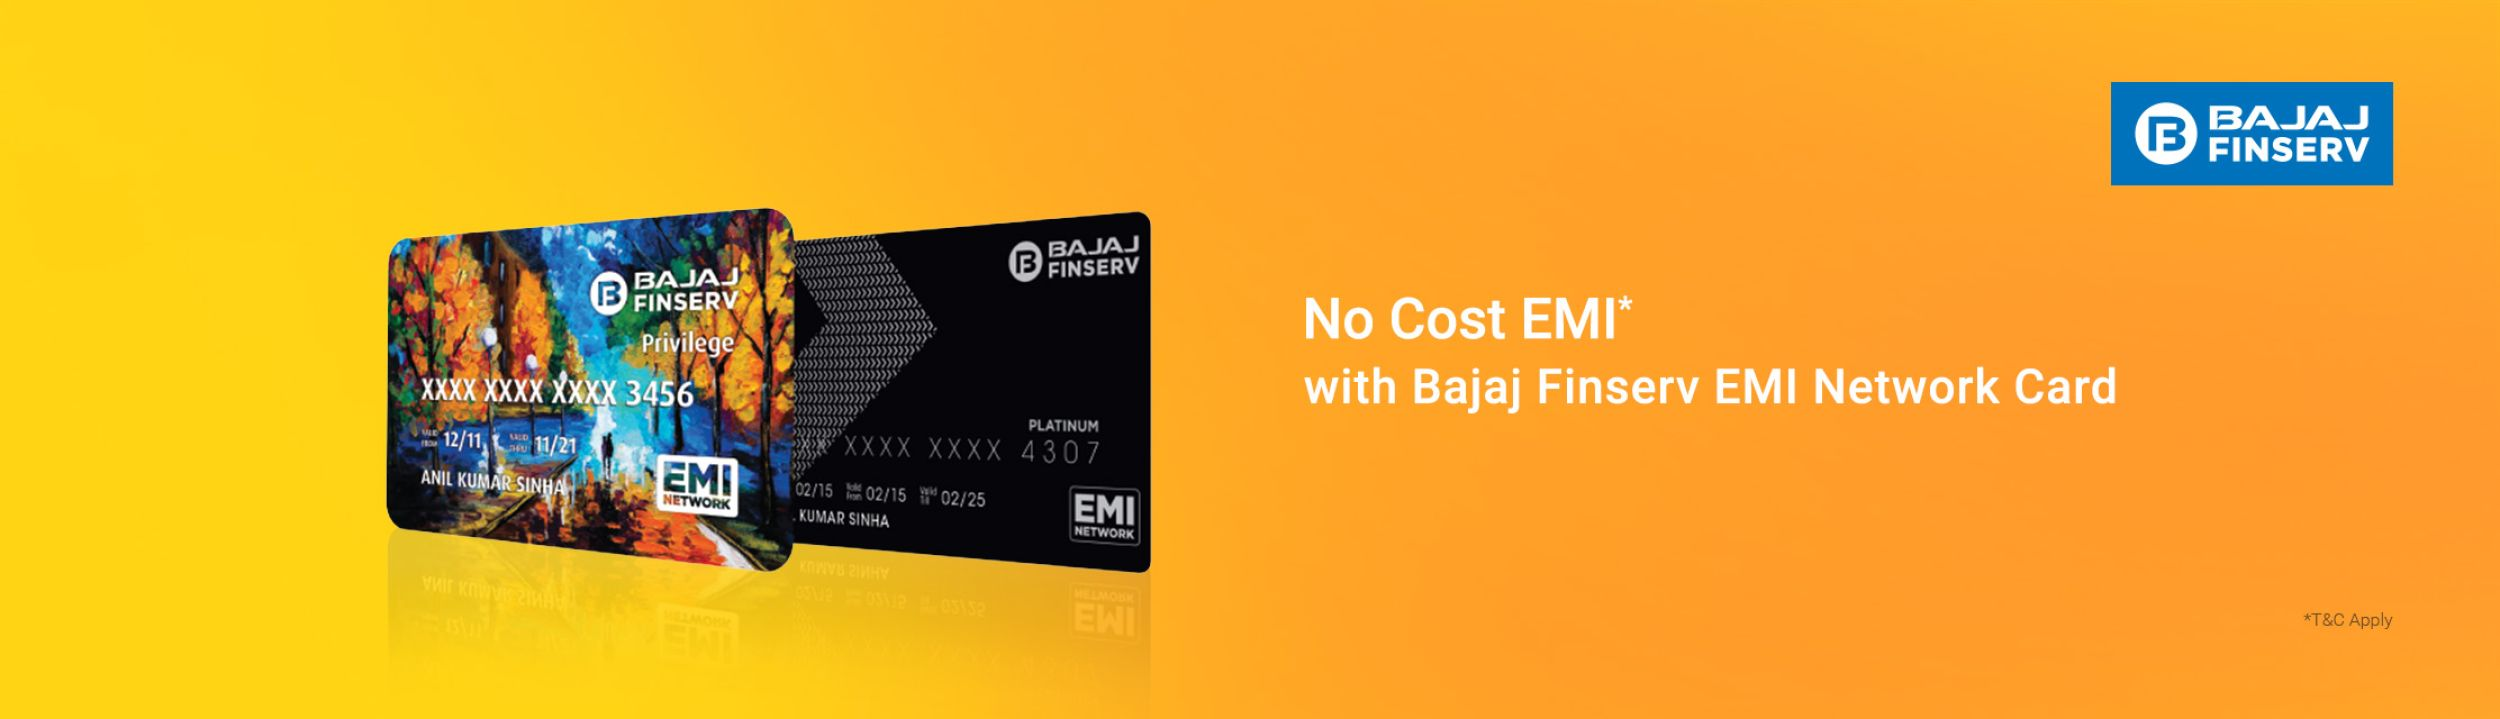 97174d28f02d Bajaj Finserv (BFL) No Cost EMI Offers - Flipkart.com